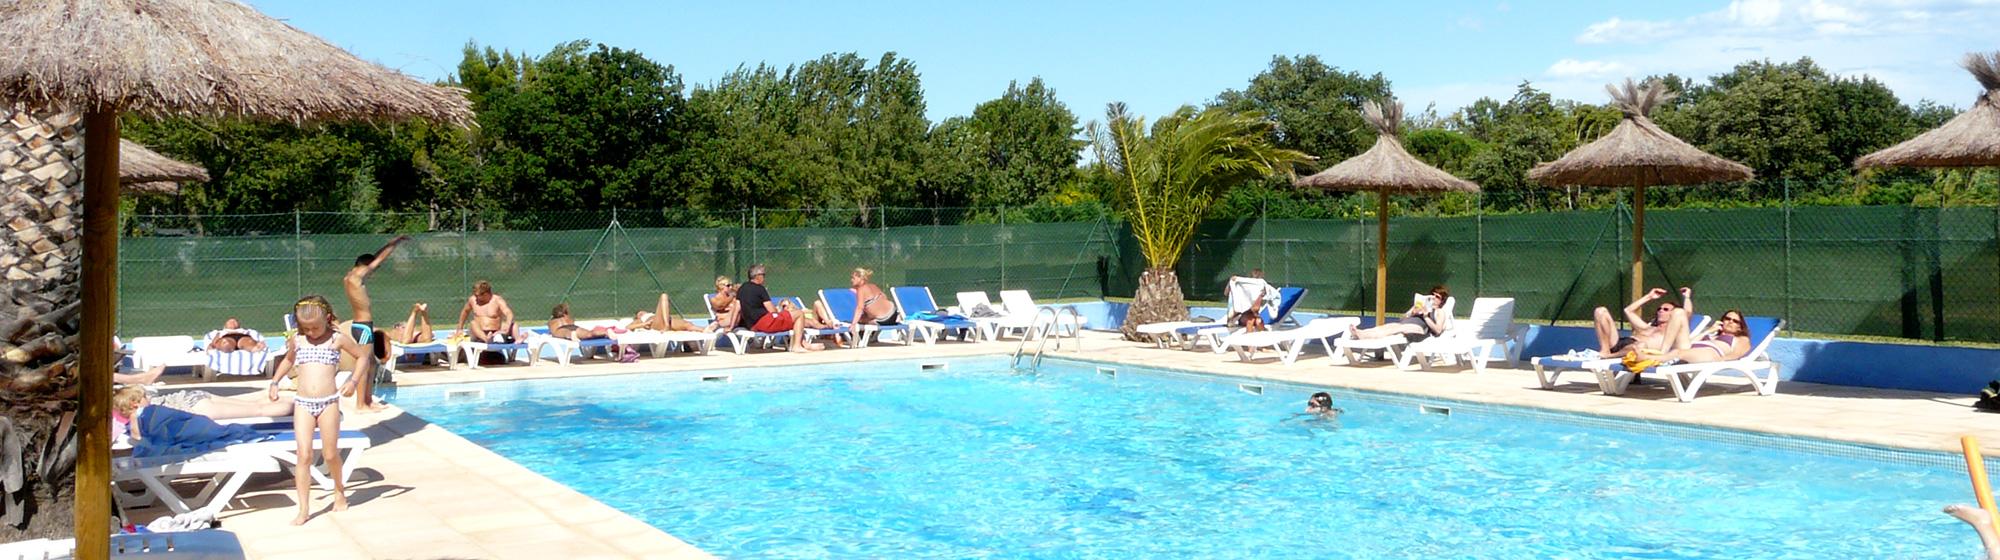 Camping Au Flamenco 3 étoiles avec piscine